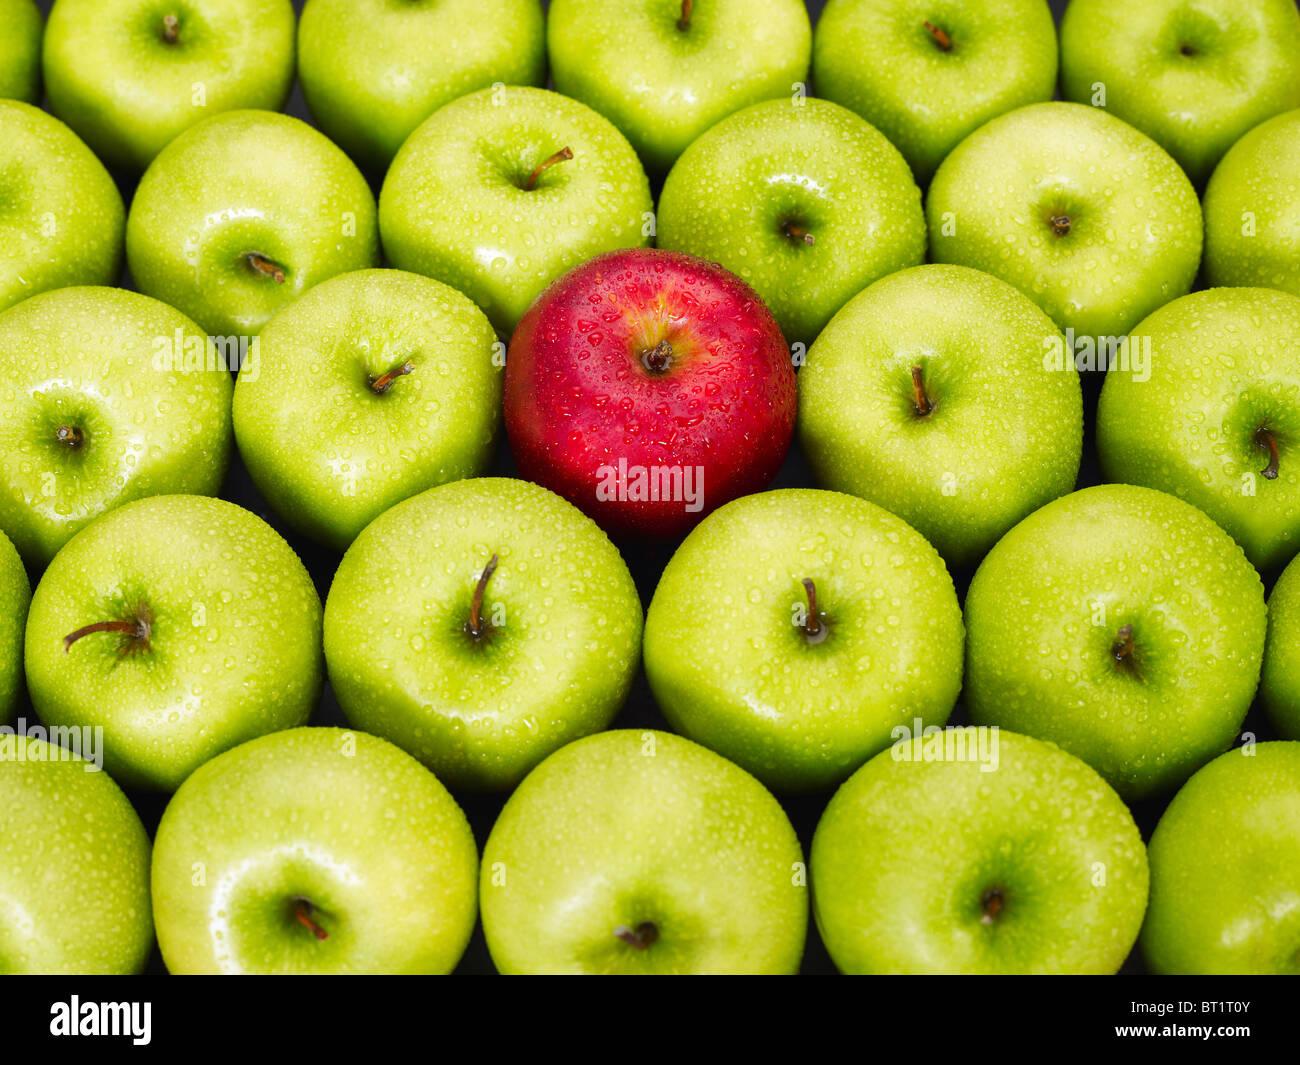 Manzana roja sobresaliendo del montón de manzanas verdes Imagen De Stock